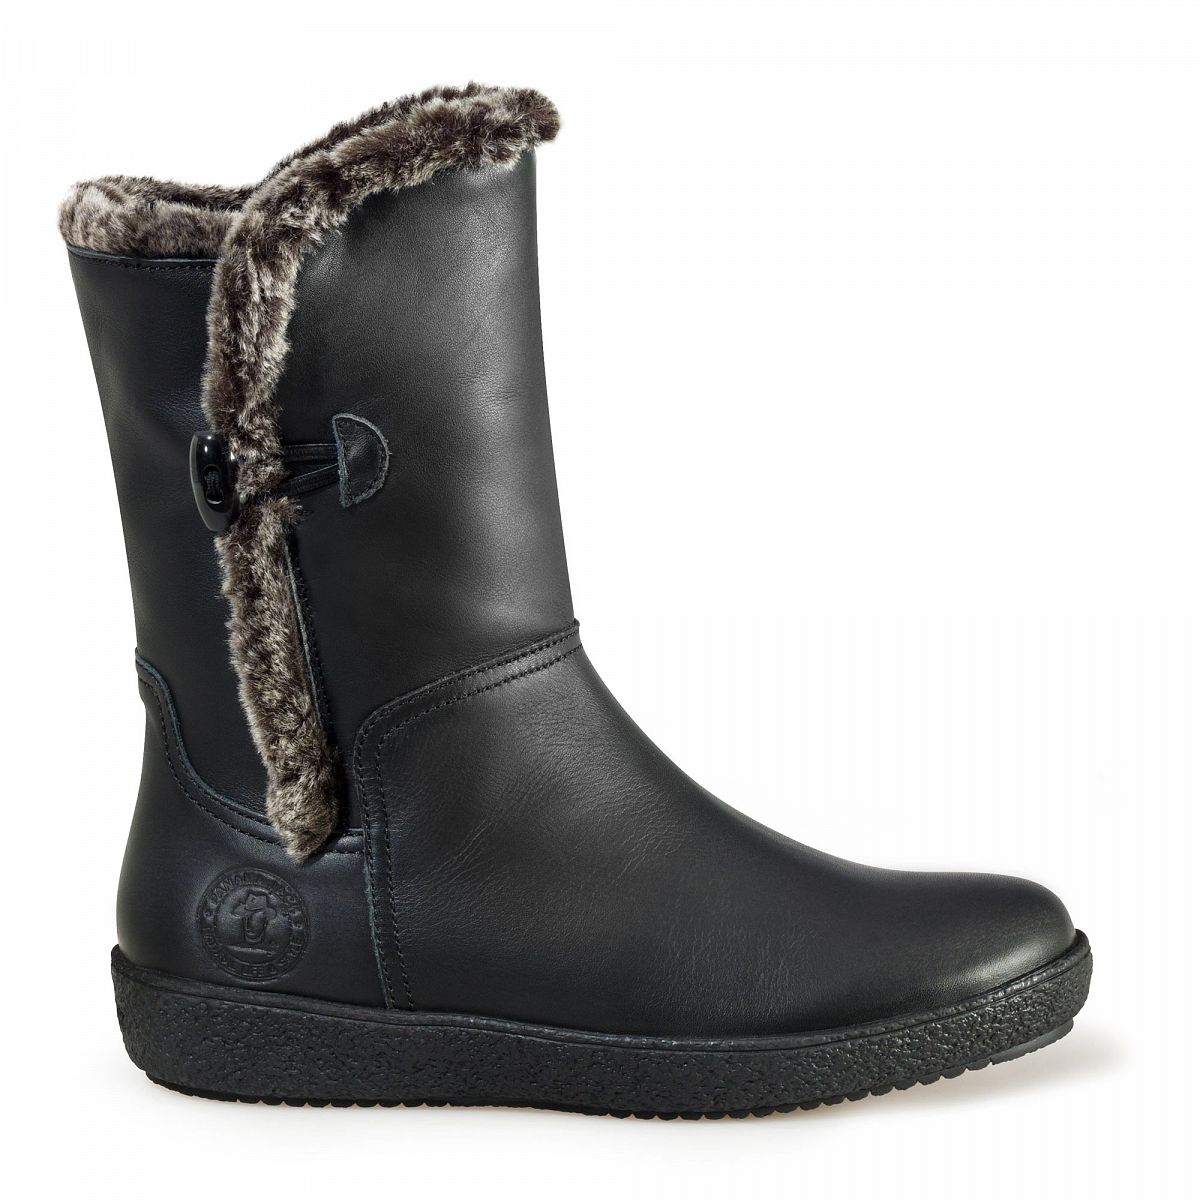 Perfect Womens Panama Jack Fur Lined Waterproof Mirabella Bark Boots